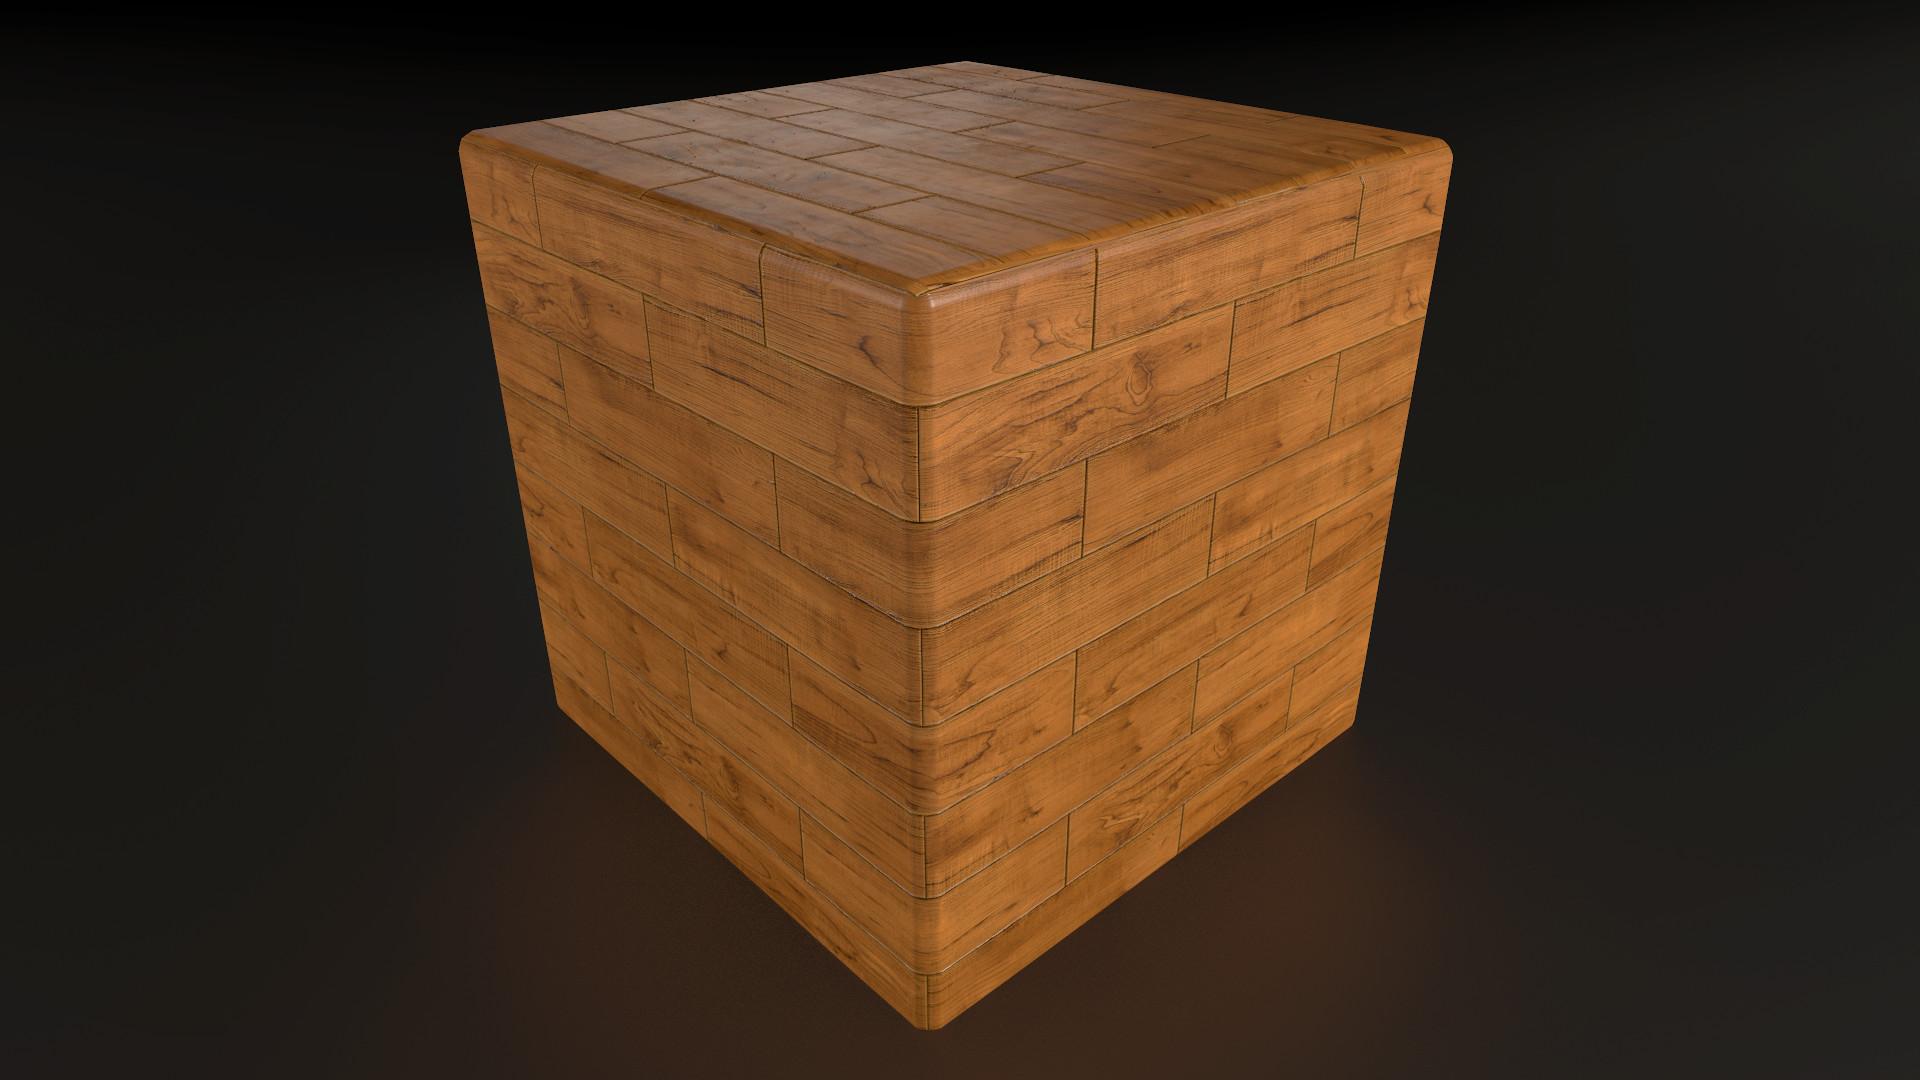 Axel loreman woodcubescramble